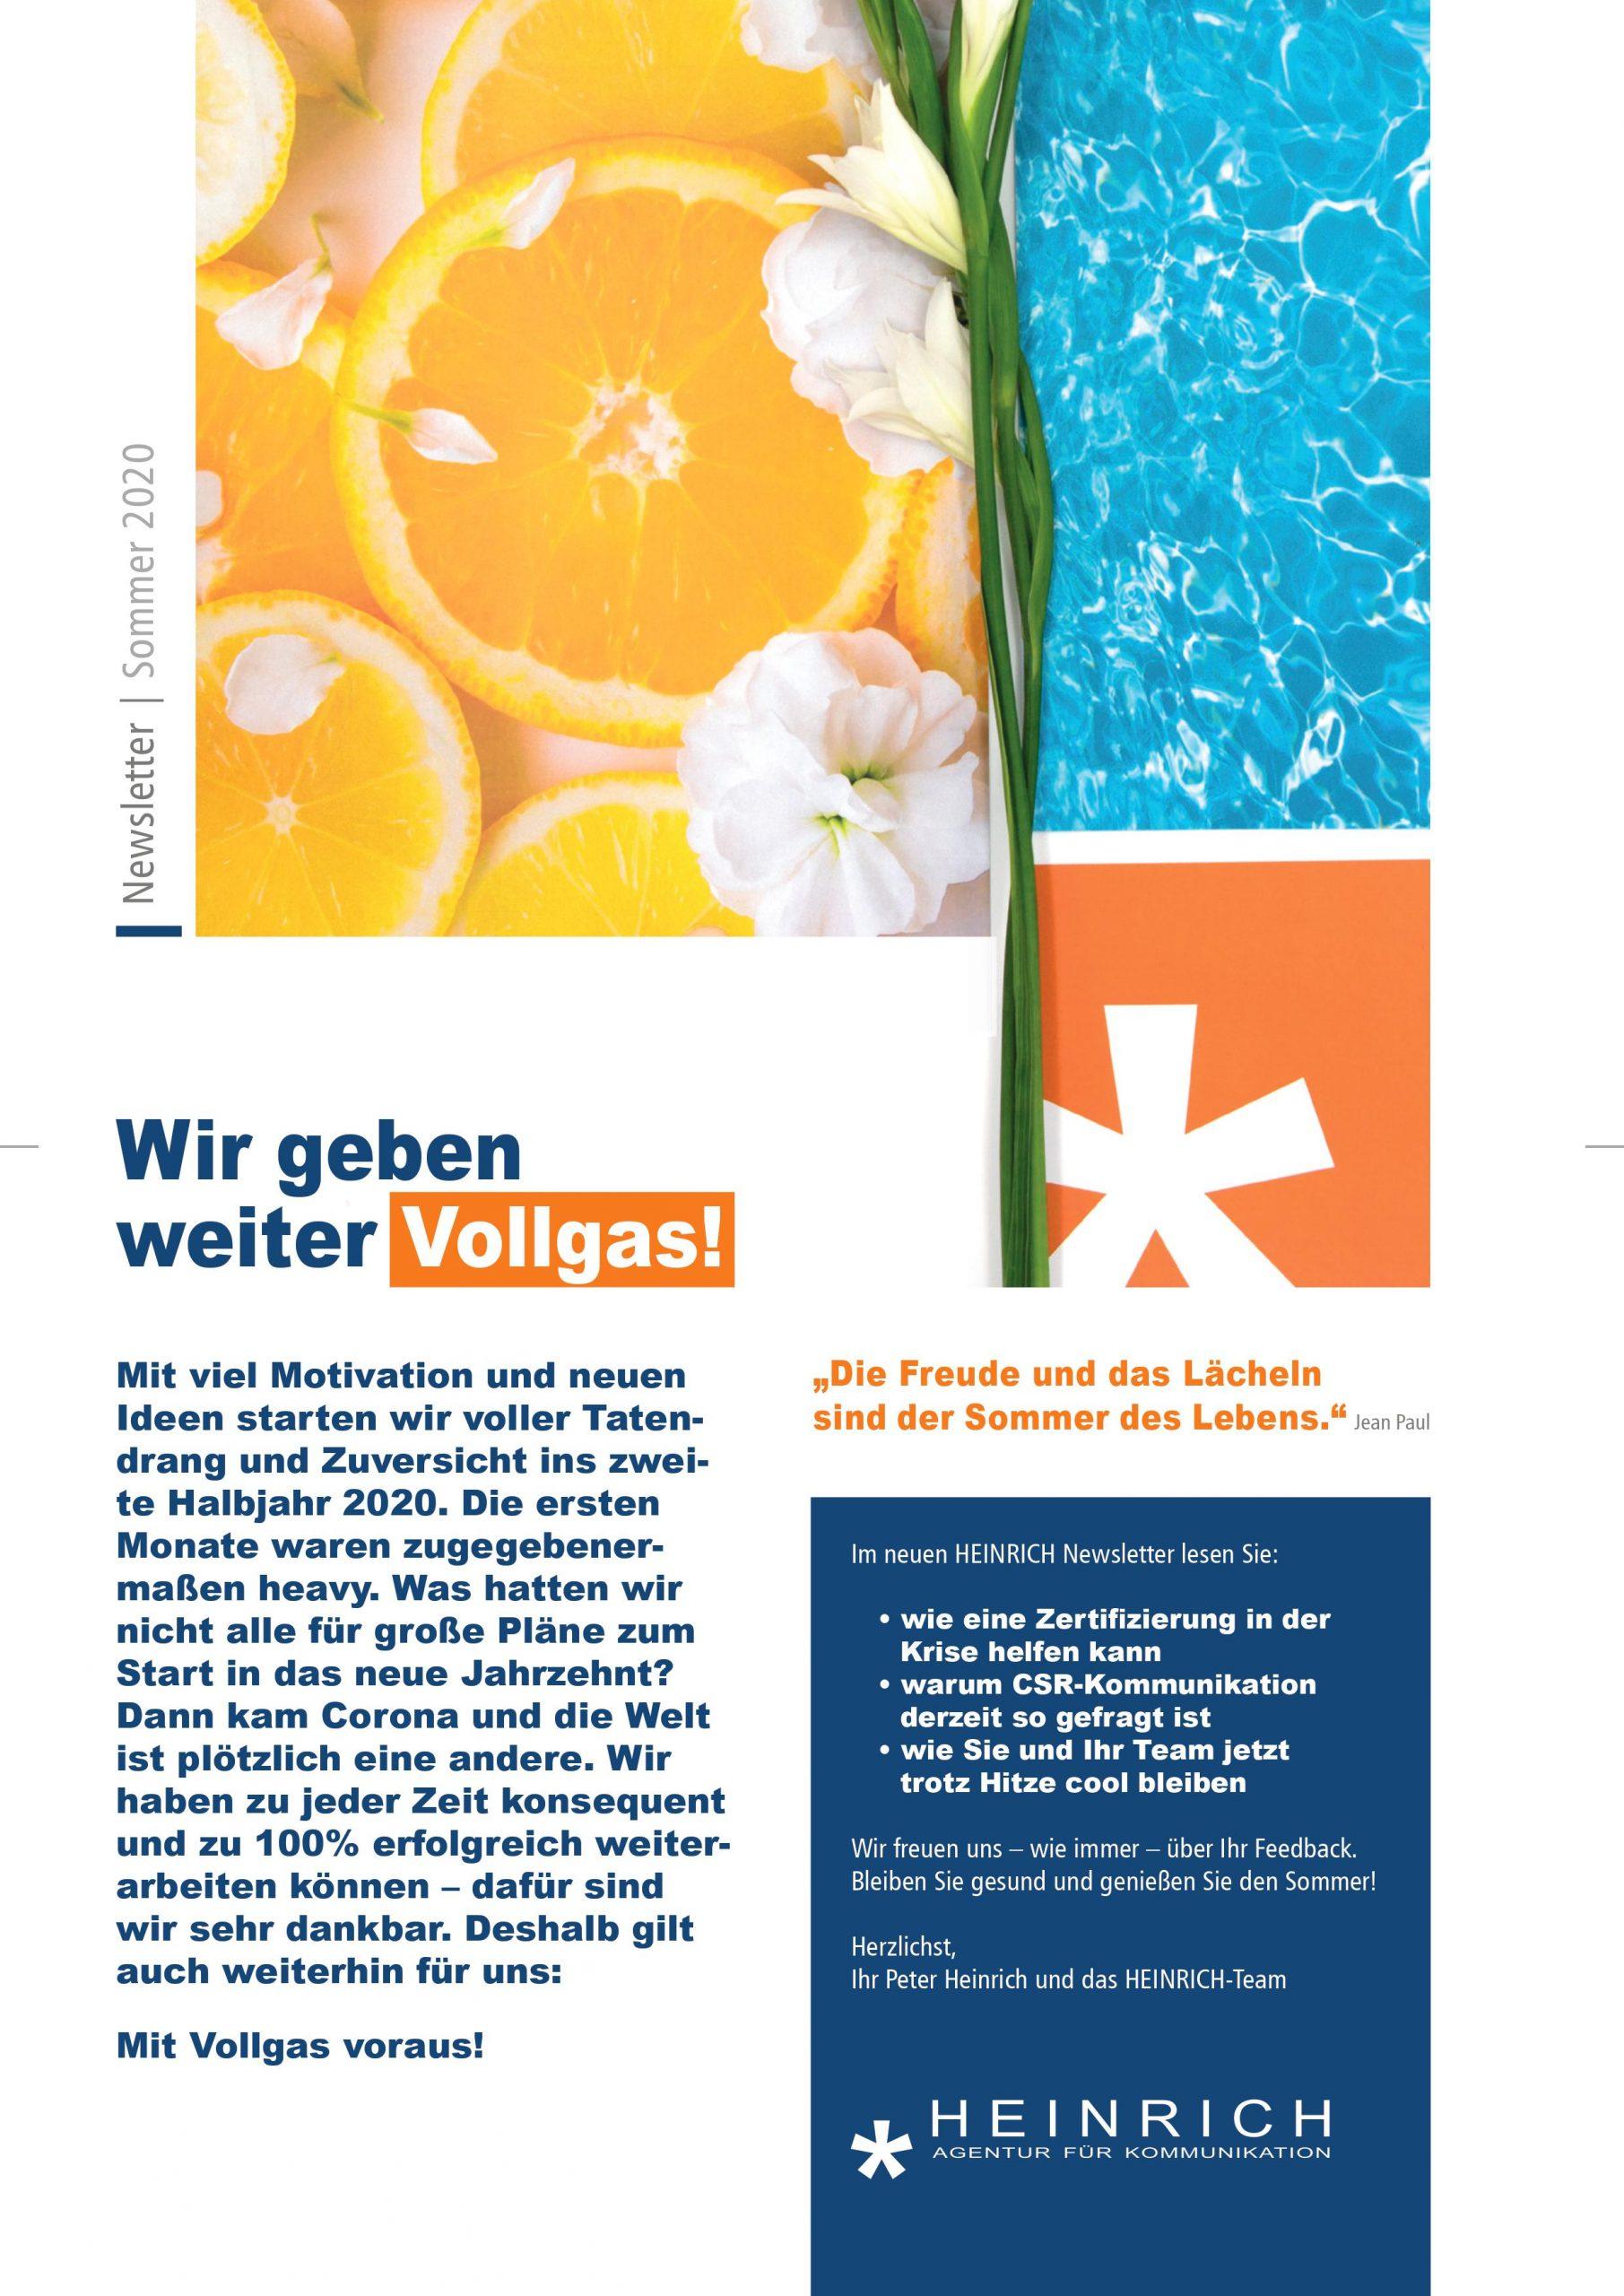 HEINRICH_Newsletter_Sommer-2020_Titel